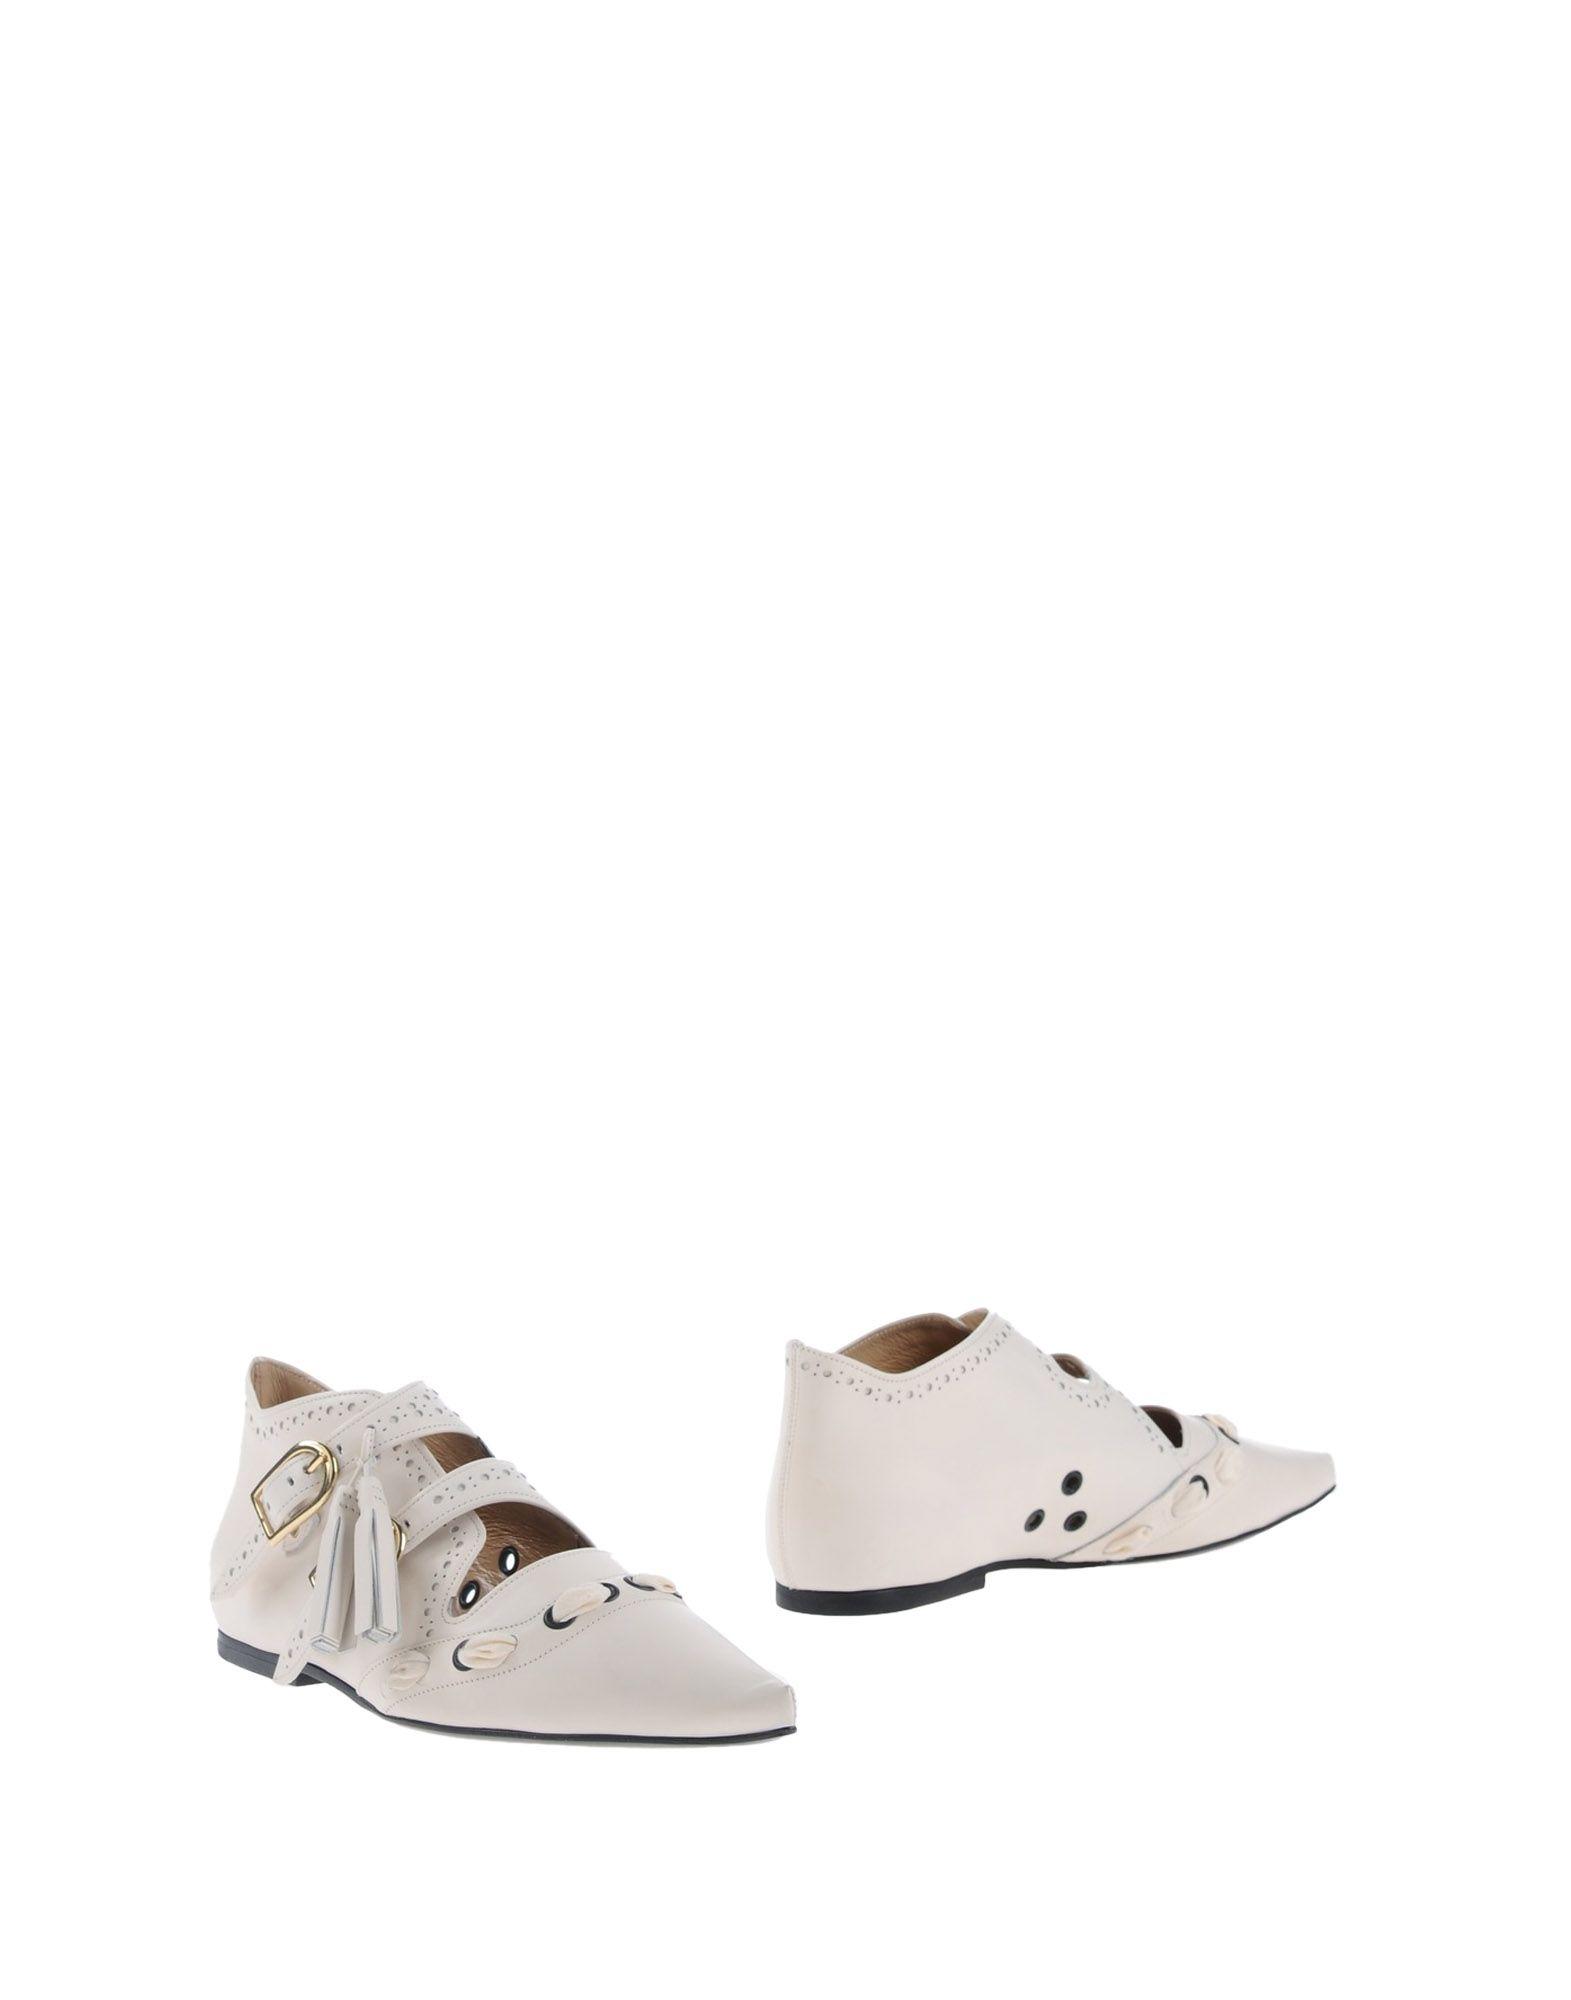 JOSEPH Ботинки ботинки swims ботинки без каблука